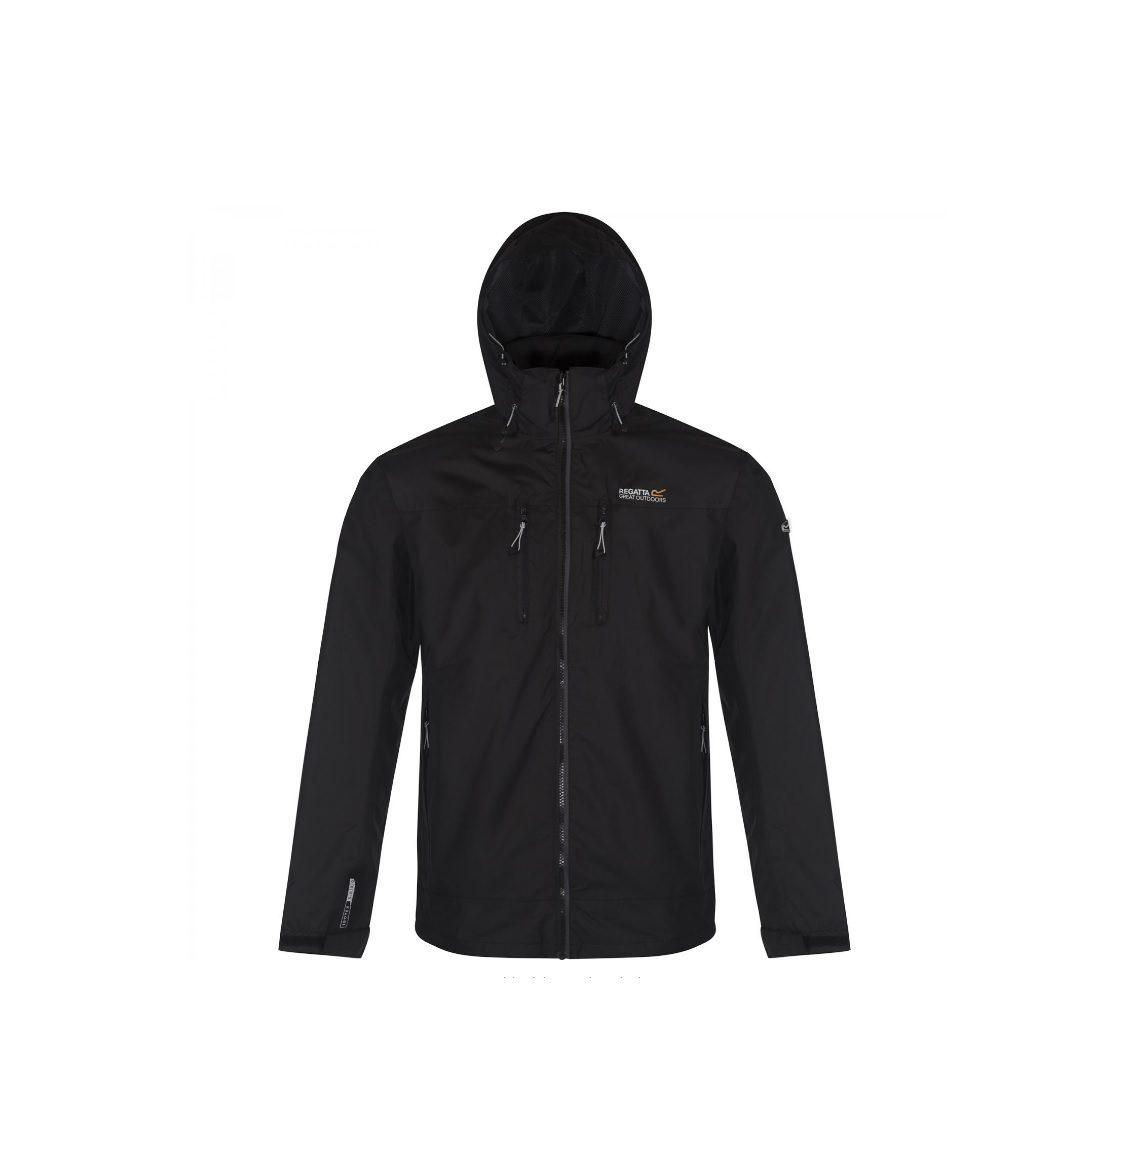 REGATTA Men's Calderdale Waterproof Jacket black